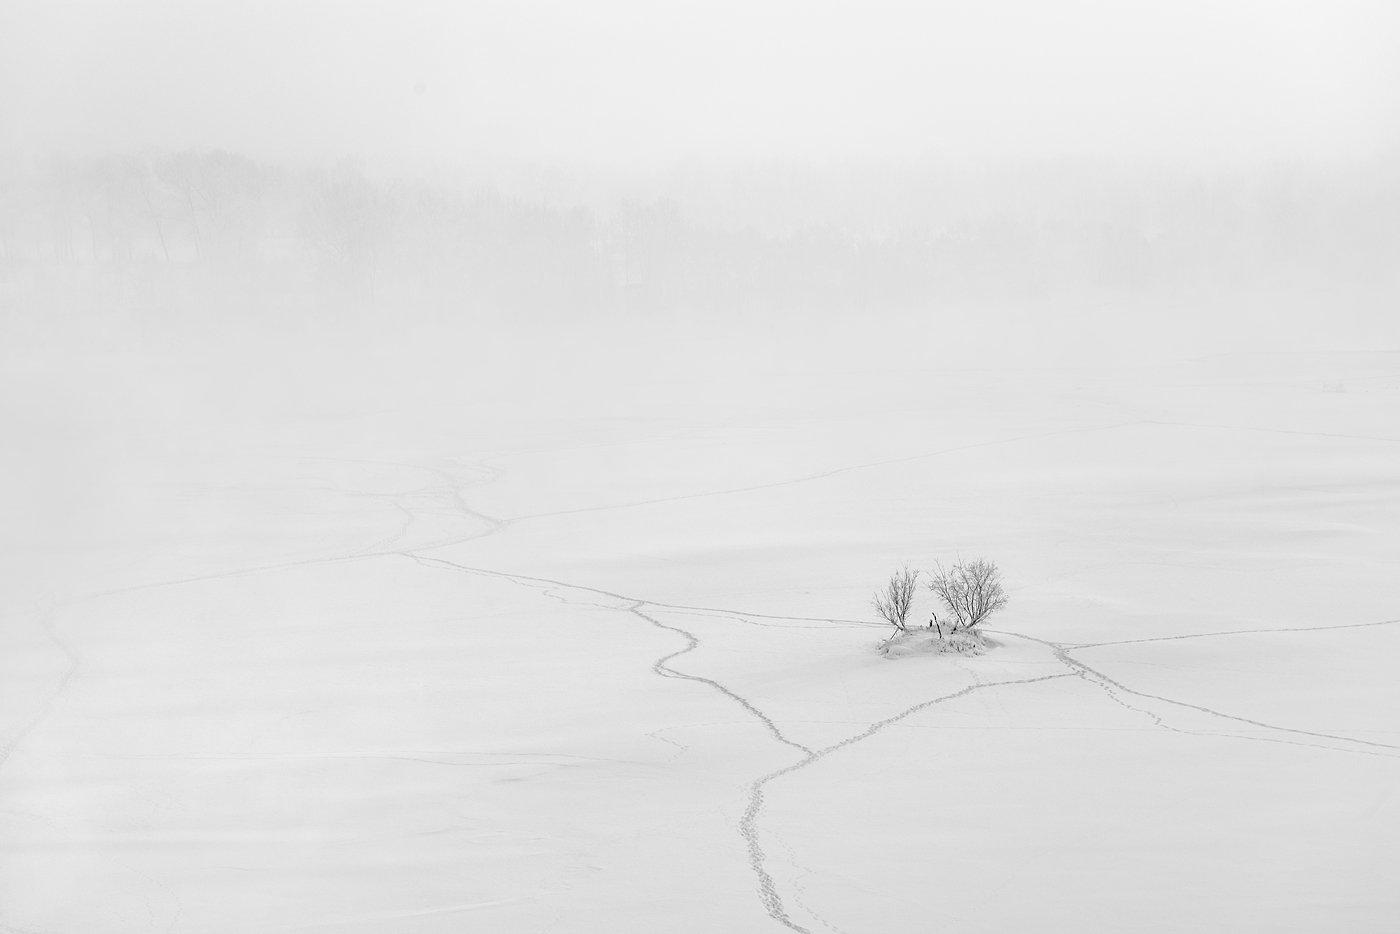 пейзаж, природа, лед, снег, туман, снегопад, тропа, дерево, куст, тропинки, река, зима, красноярск, енисей, татышев, чб, черно-белая, минимализм,, Антипов Дмитрий